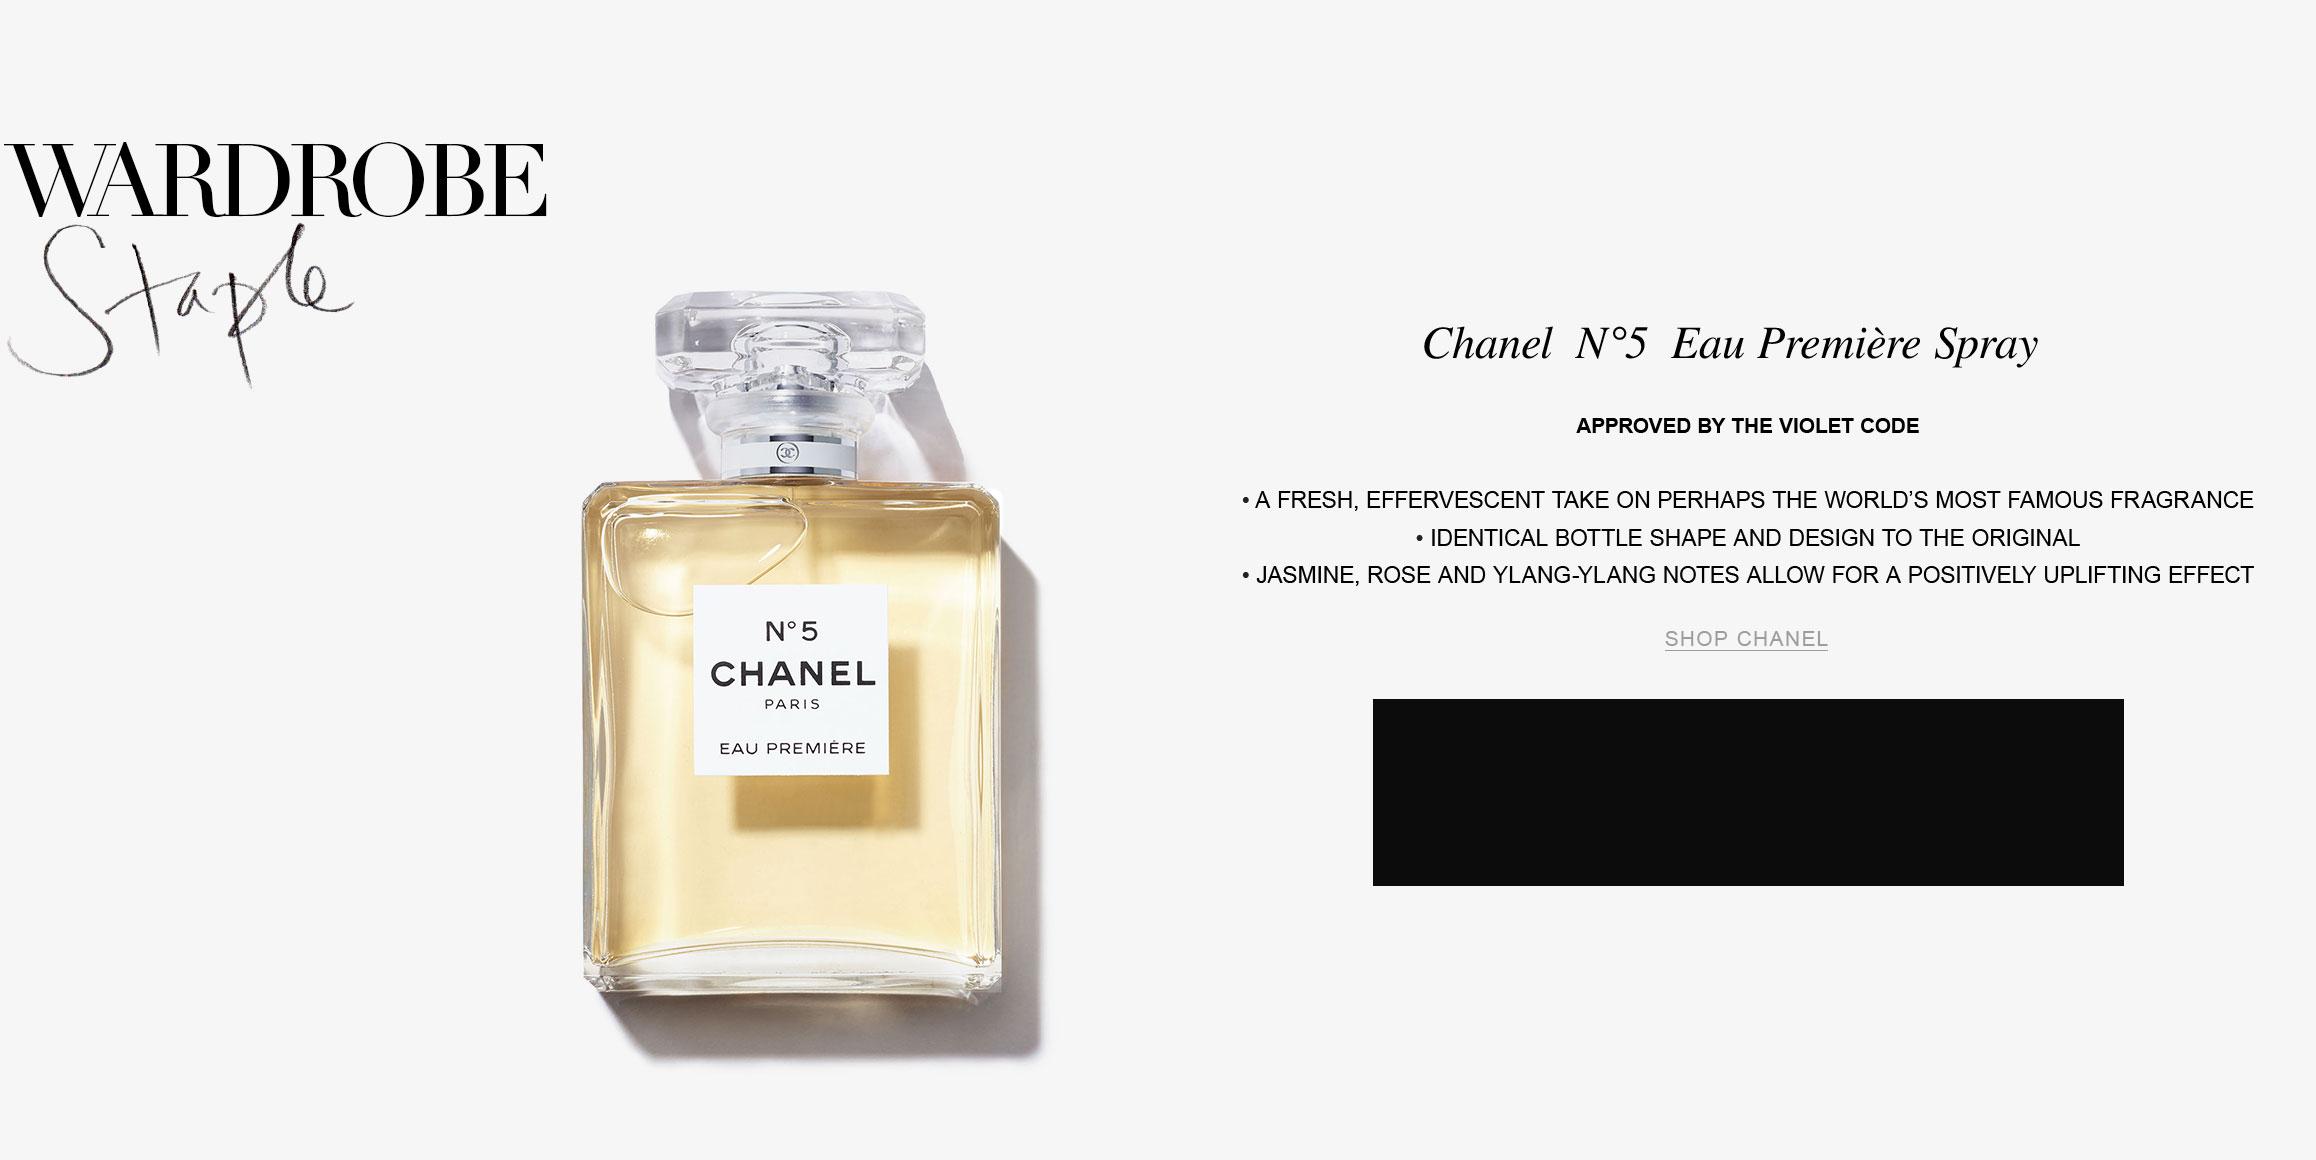 CHANEL-N5-EAU-PREMIÈRE-SPRAY-Interstitial.jpg